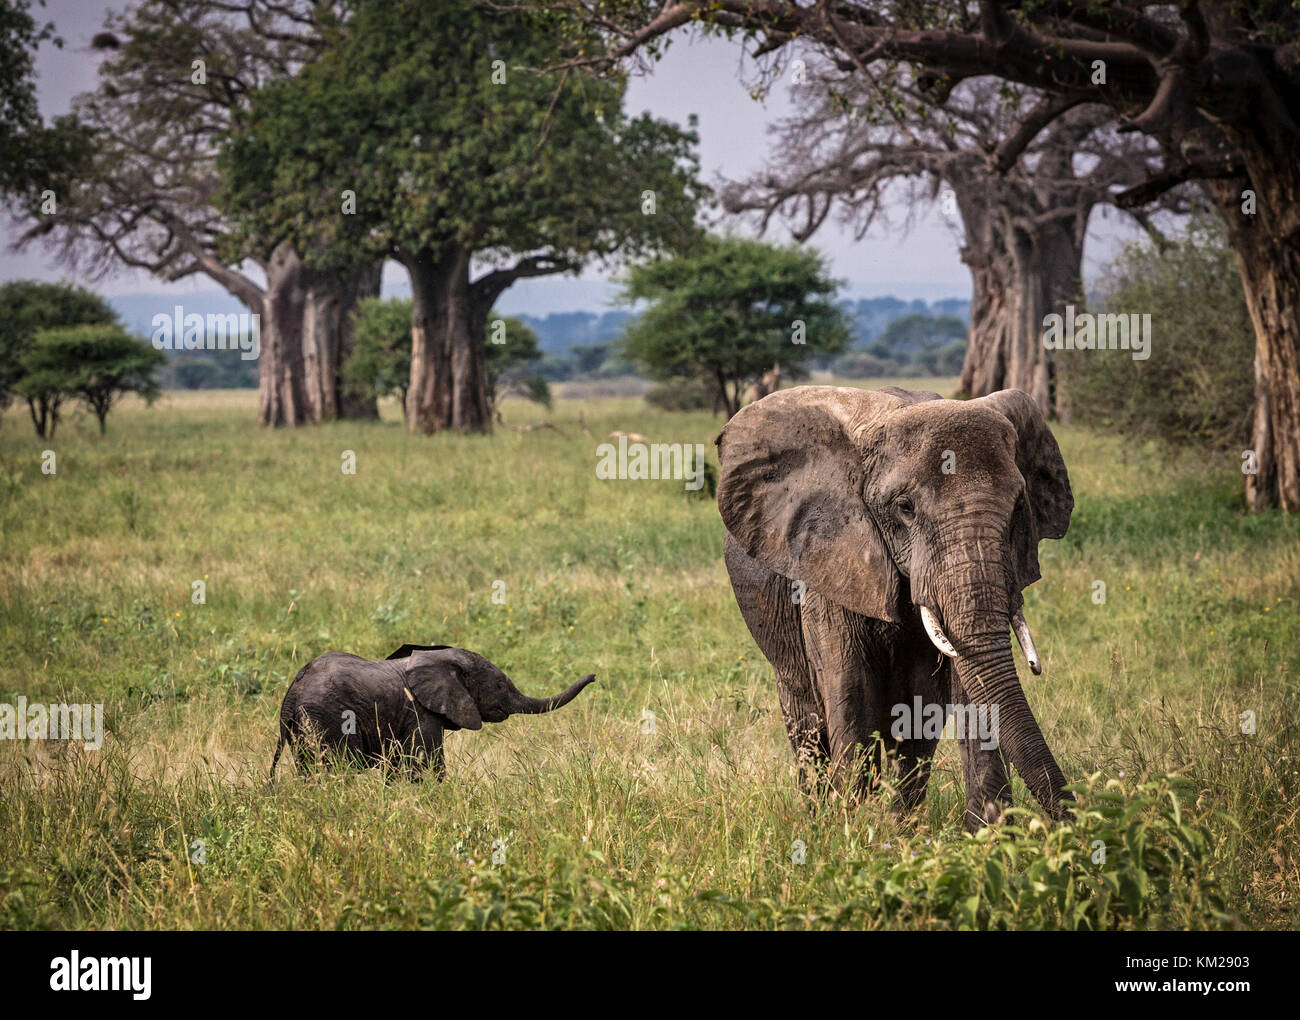 L'éléphant d'Afrique avec bébé in The Serengeti, Tanzania, Africa Photo Stock